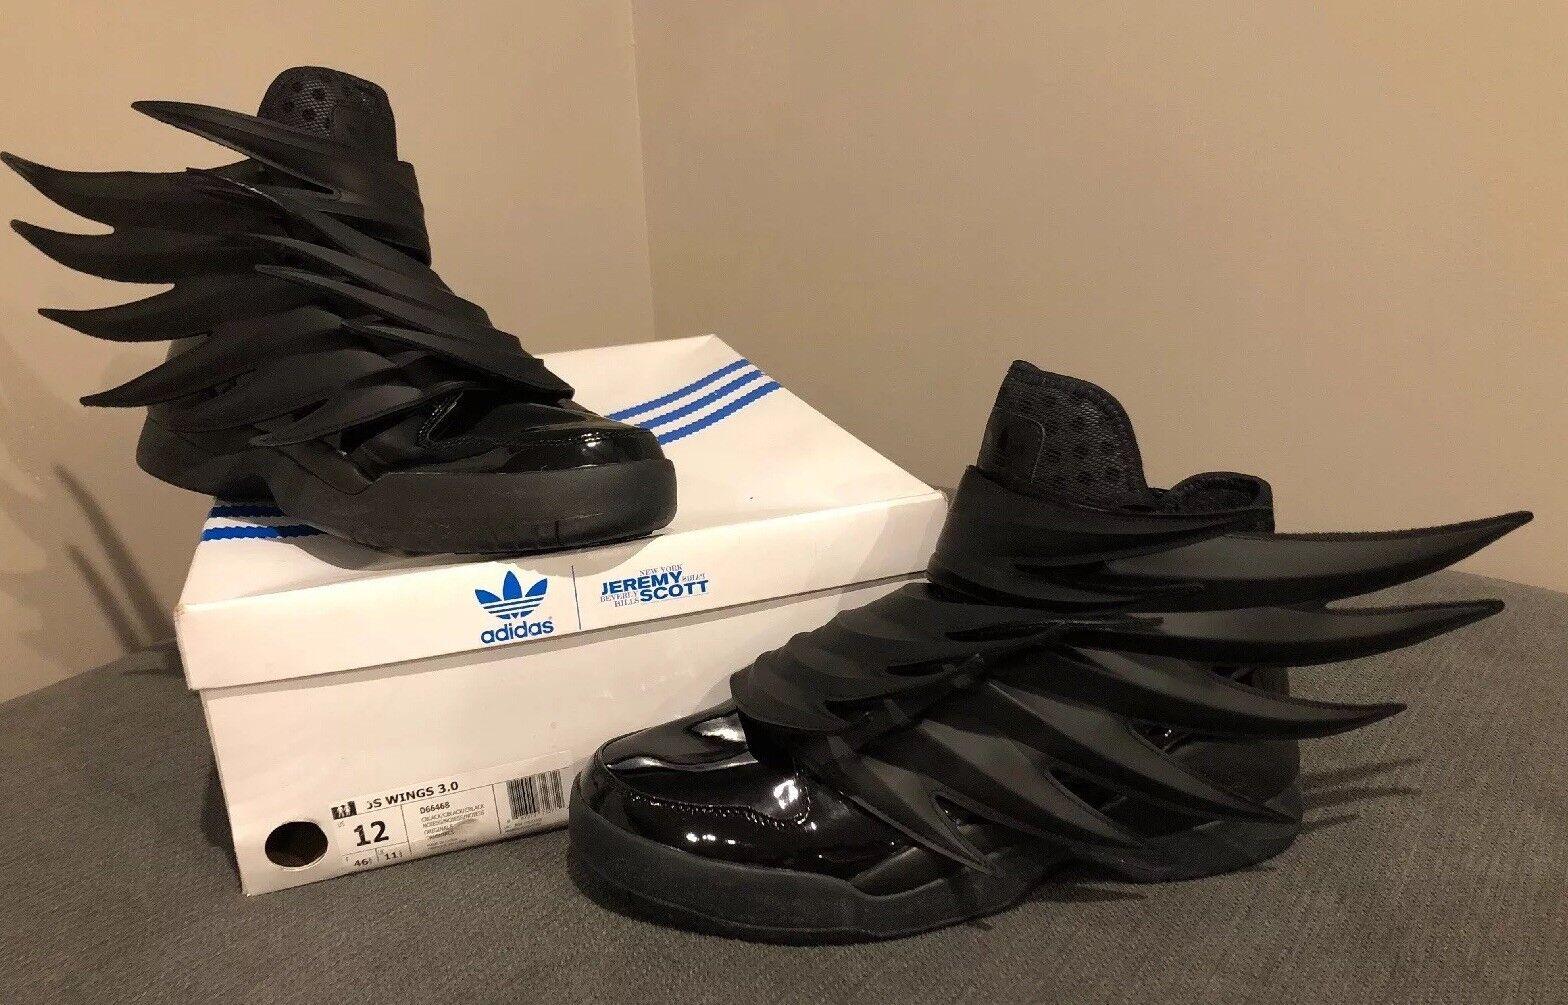 Adidas Jeremy Scott, Wings 3.0, Dark Knight Batman, D66468, Size 12, RARE